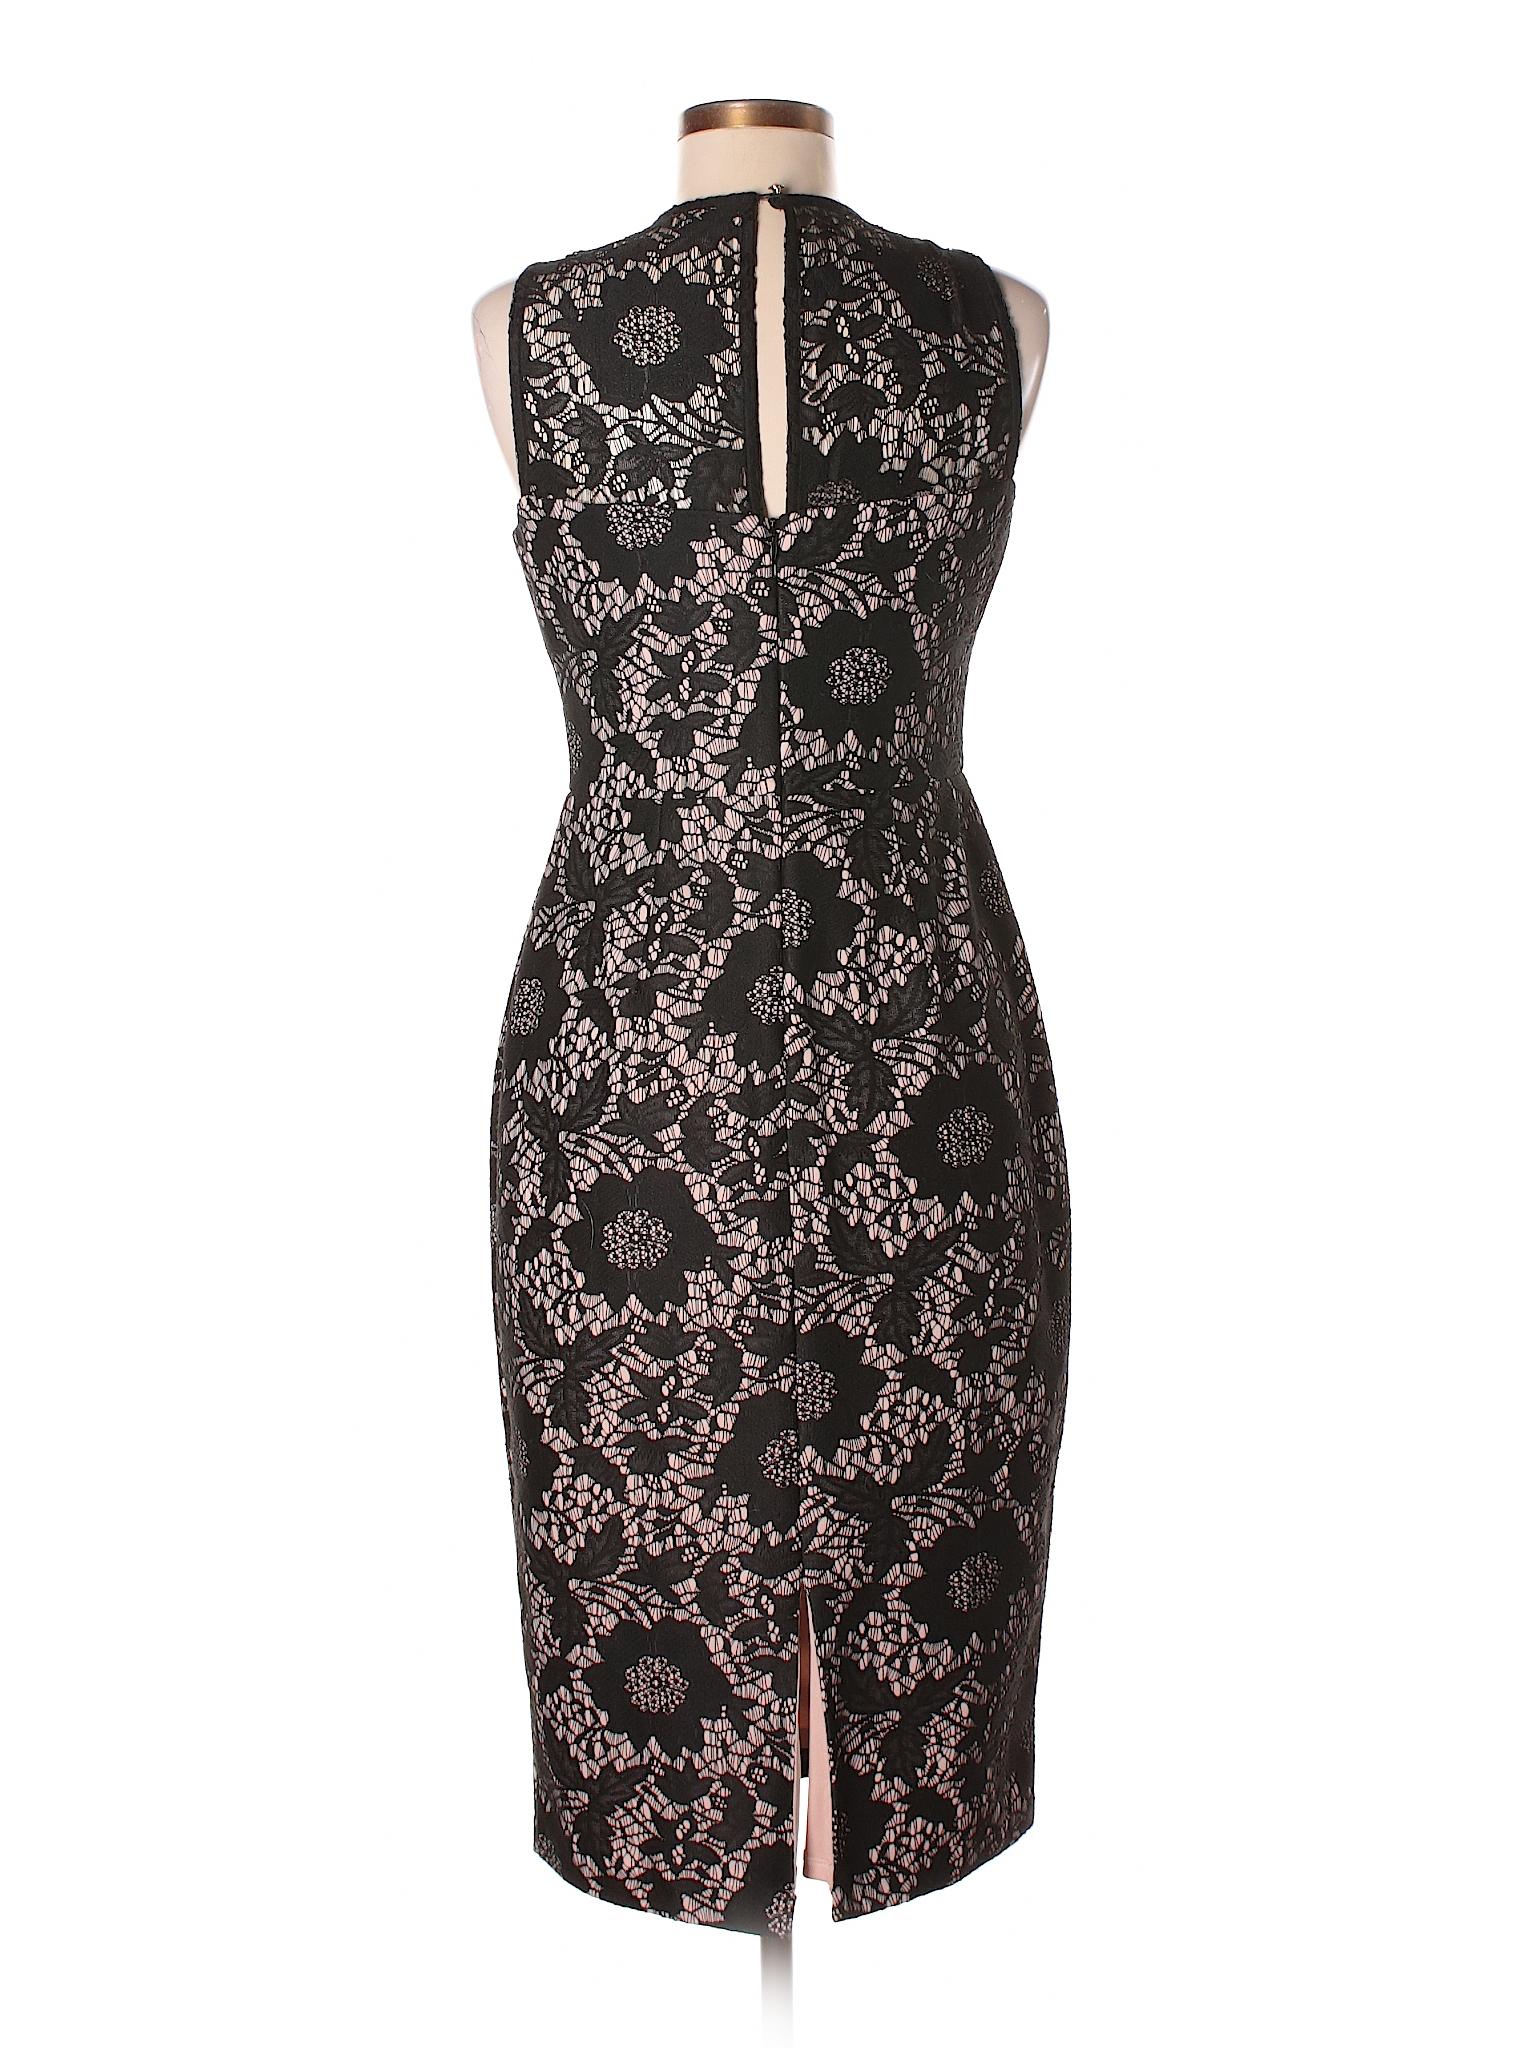 Boutique Casual Jessica winter Simpson Dress rZrv0x